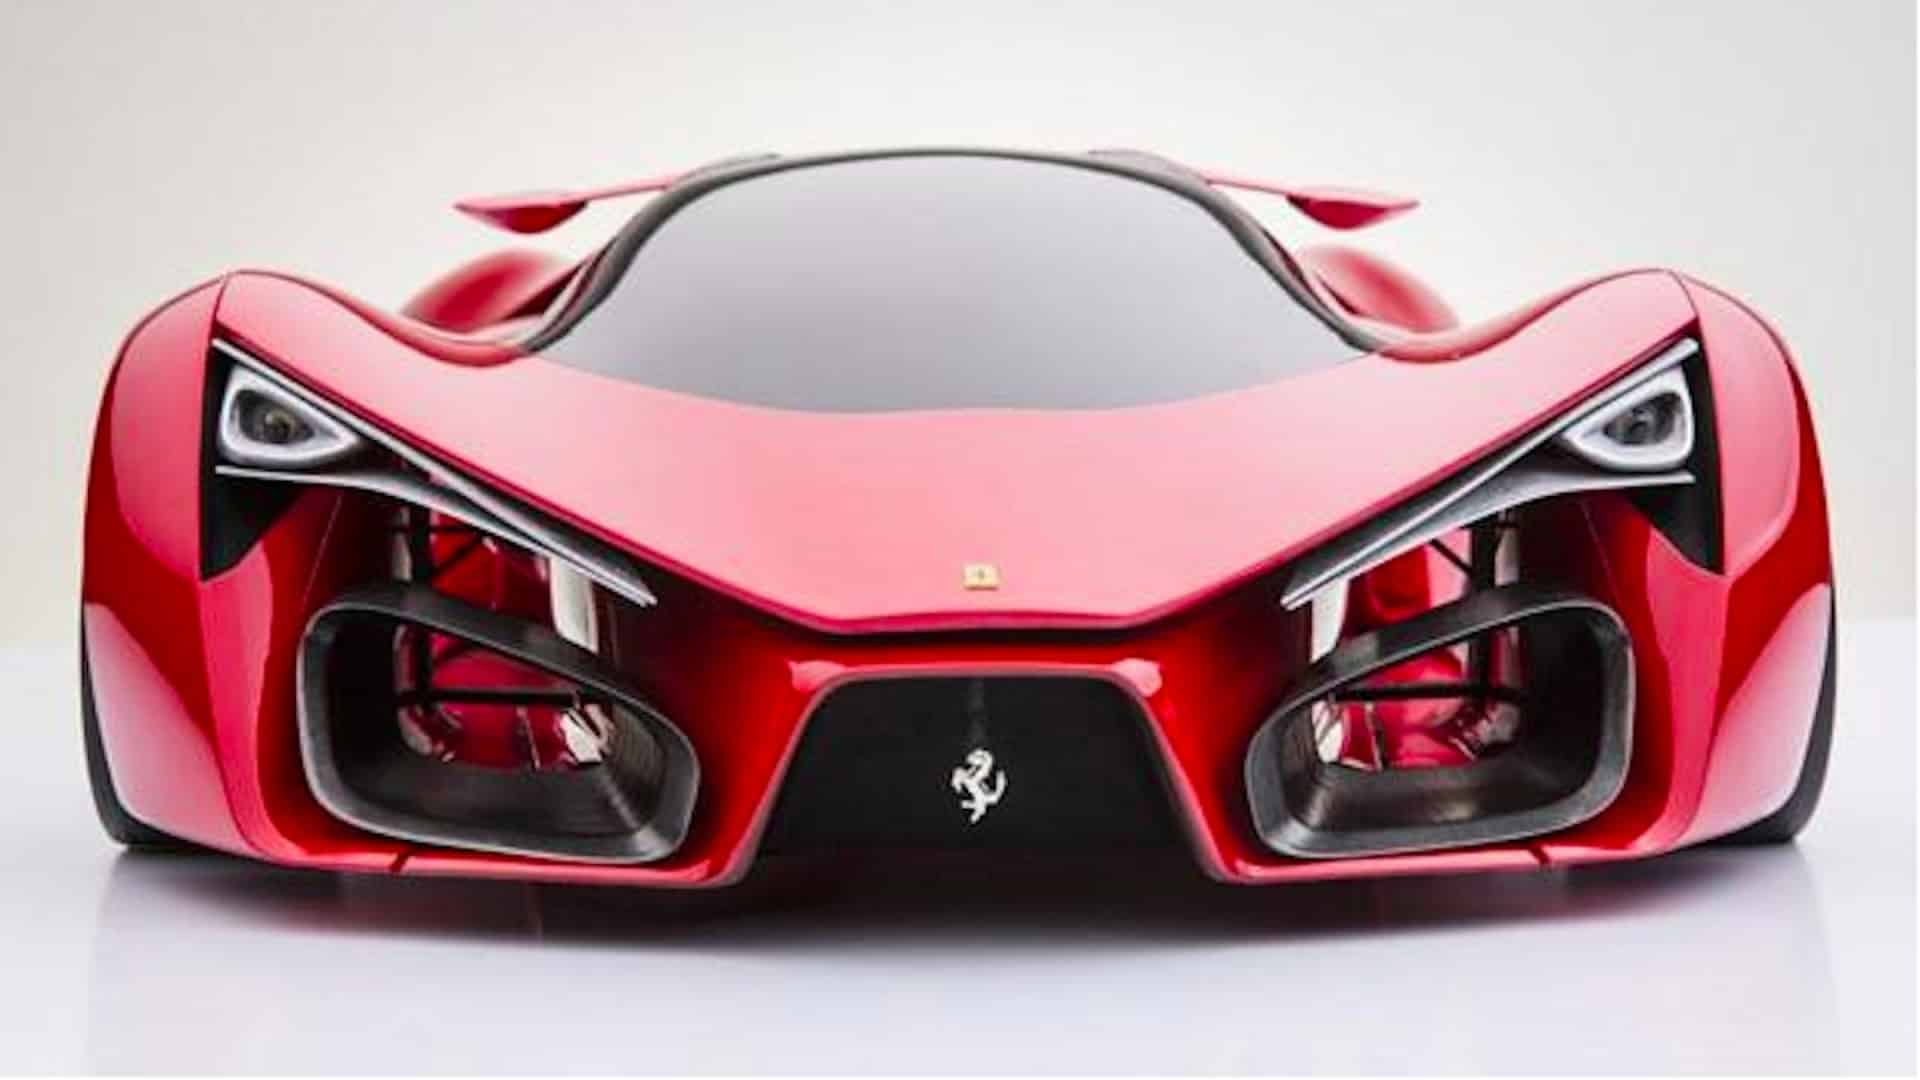 hire luxury ferrari rental rome car new sport speciale rent aaa